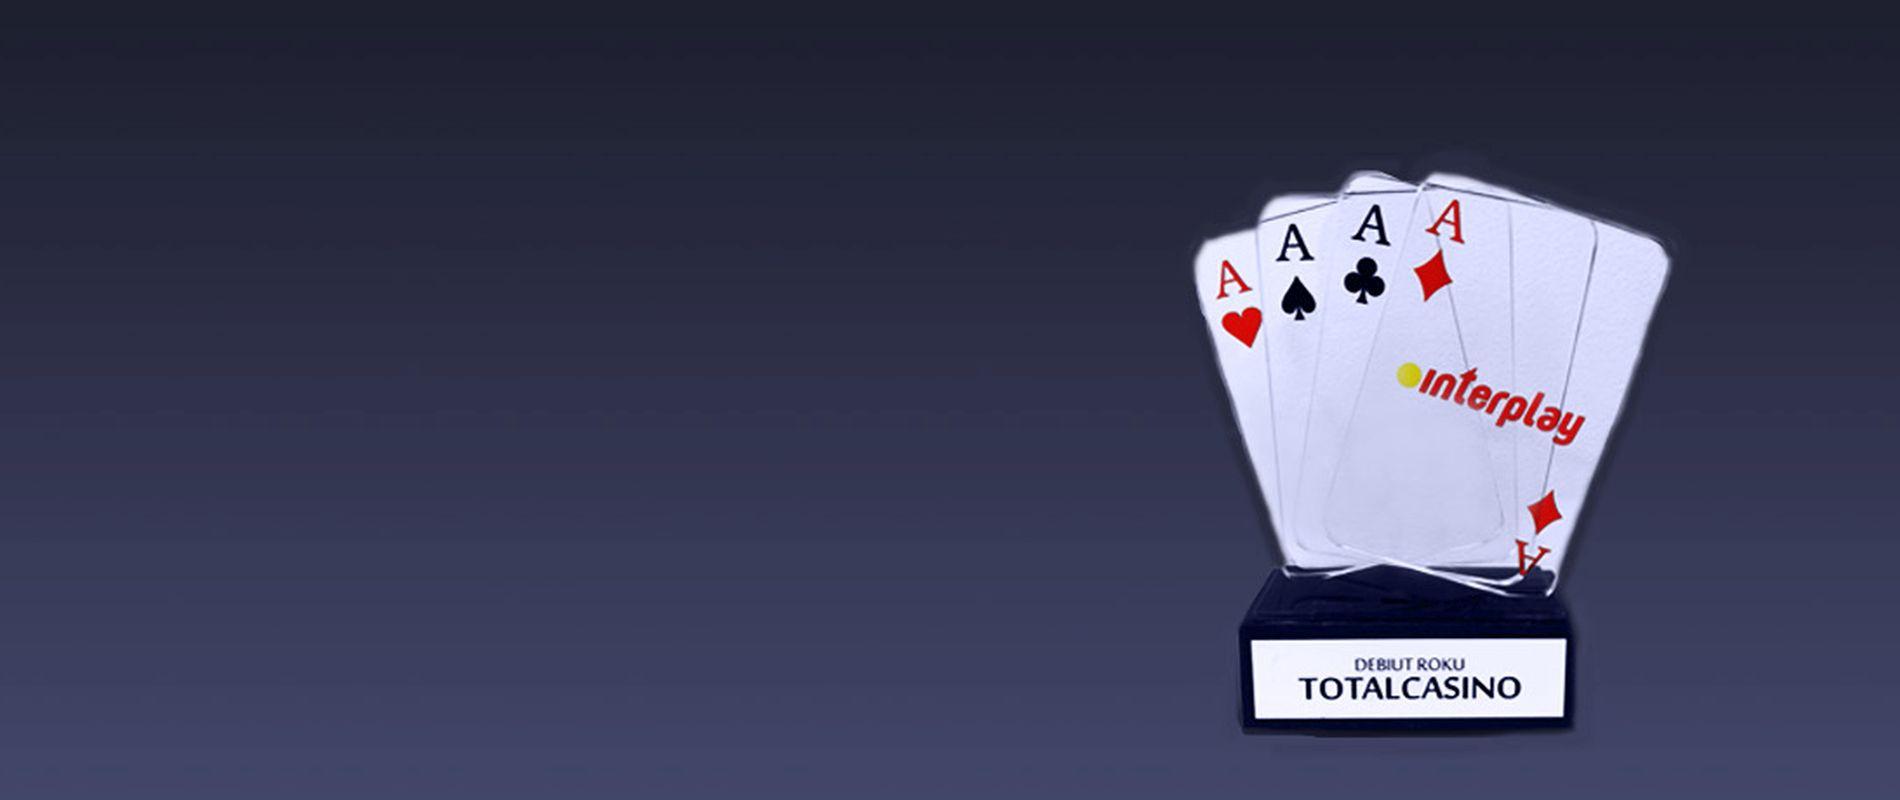 Total Casino - Nagroda Interplay